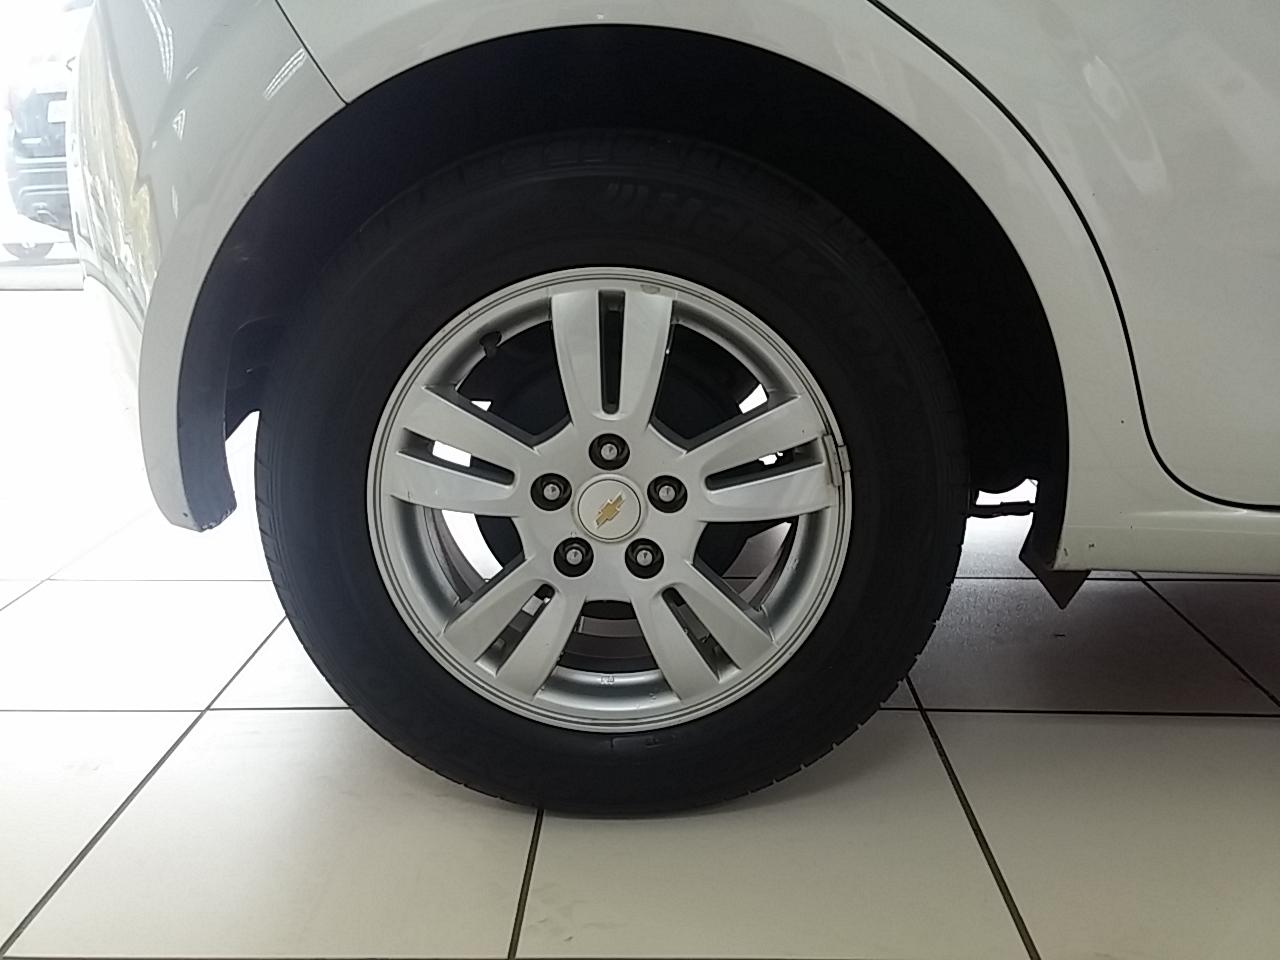 Chevrolet Sonic 1.6 Ls 5dr